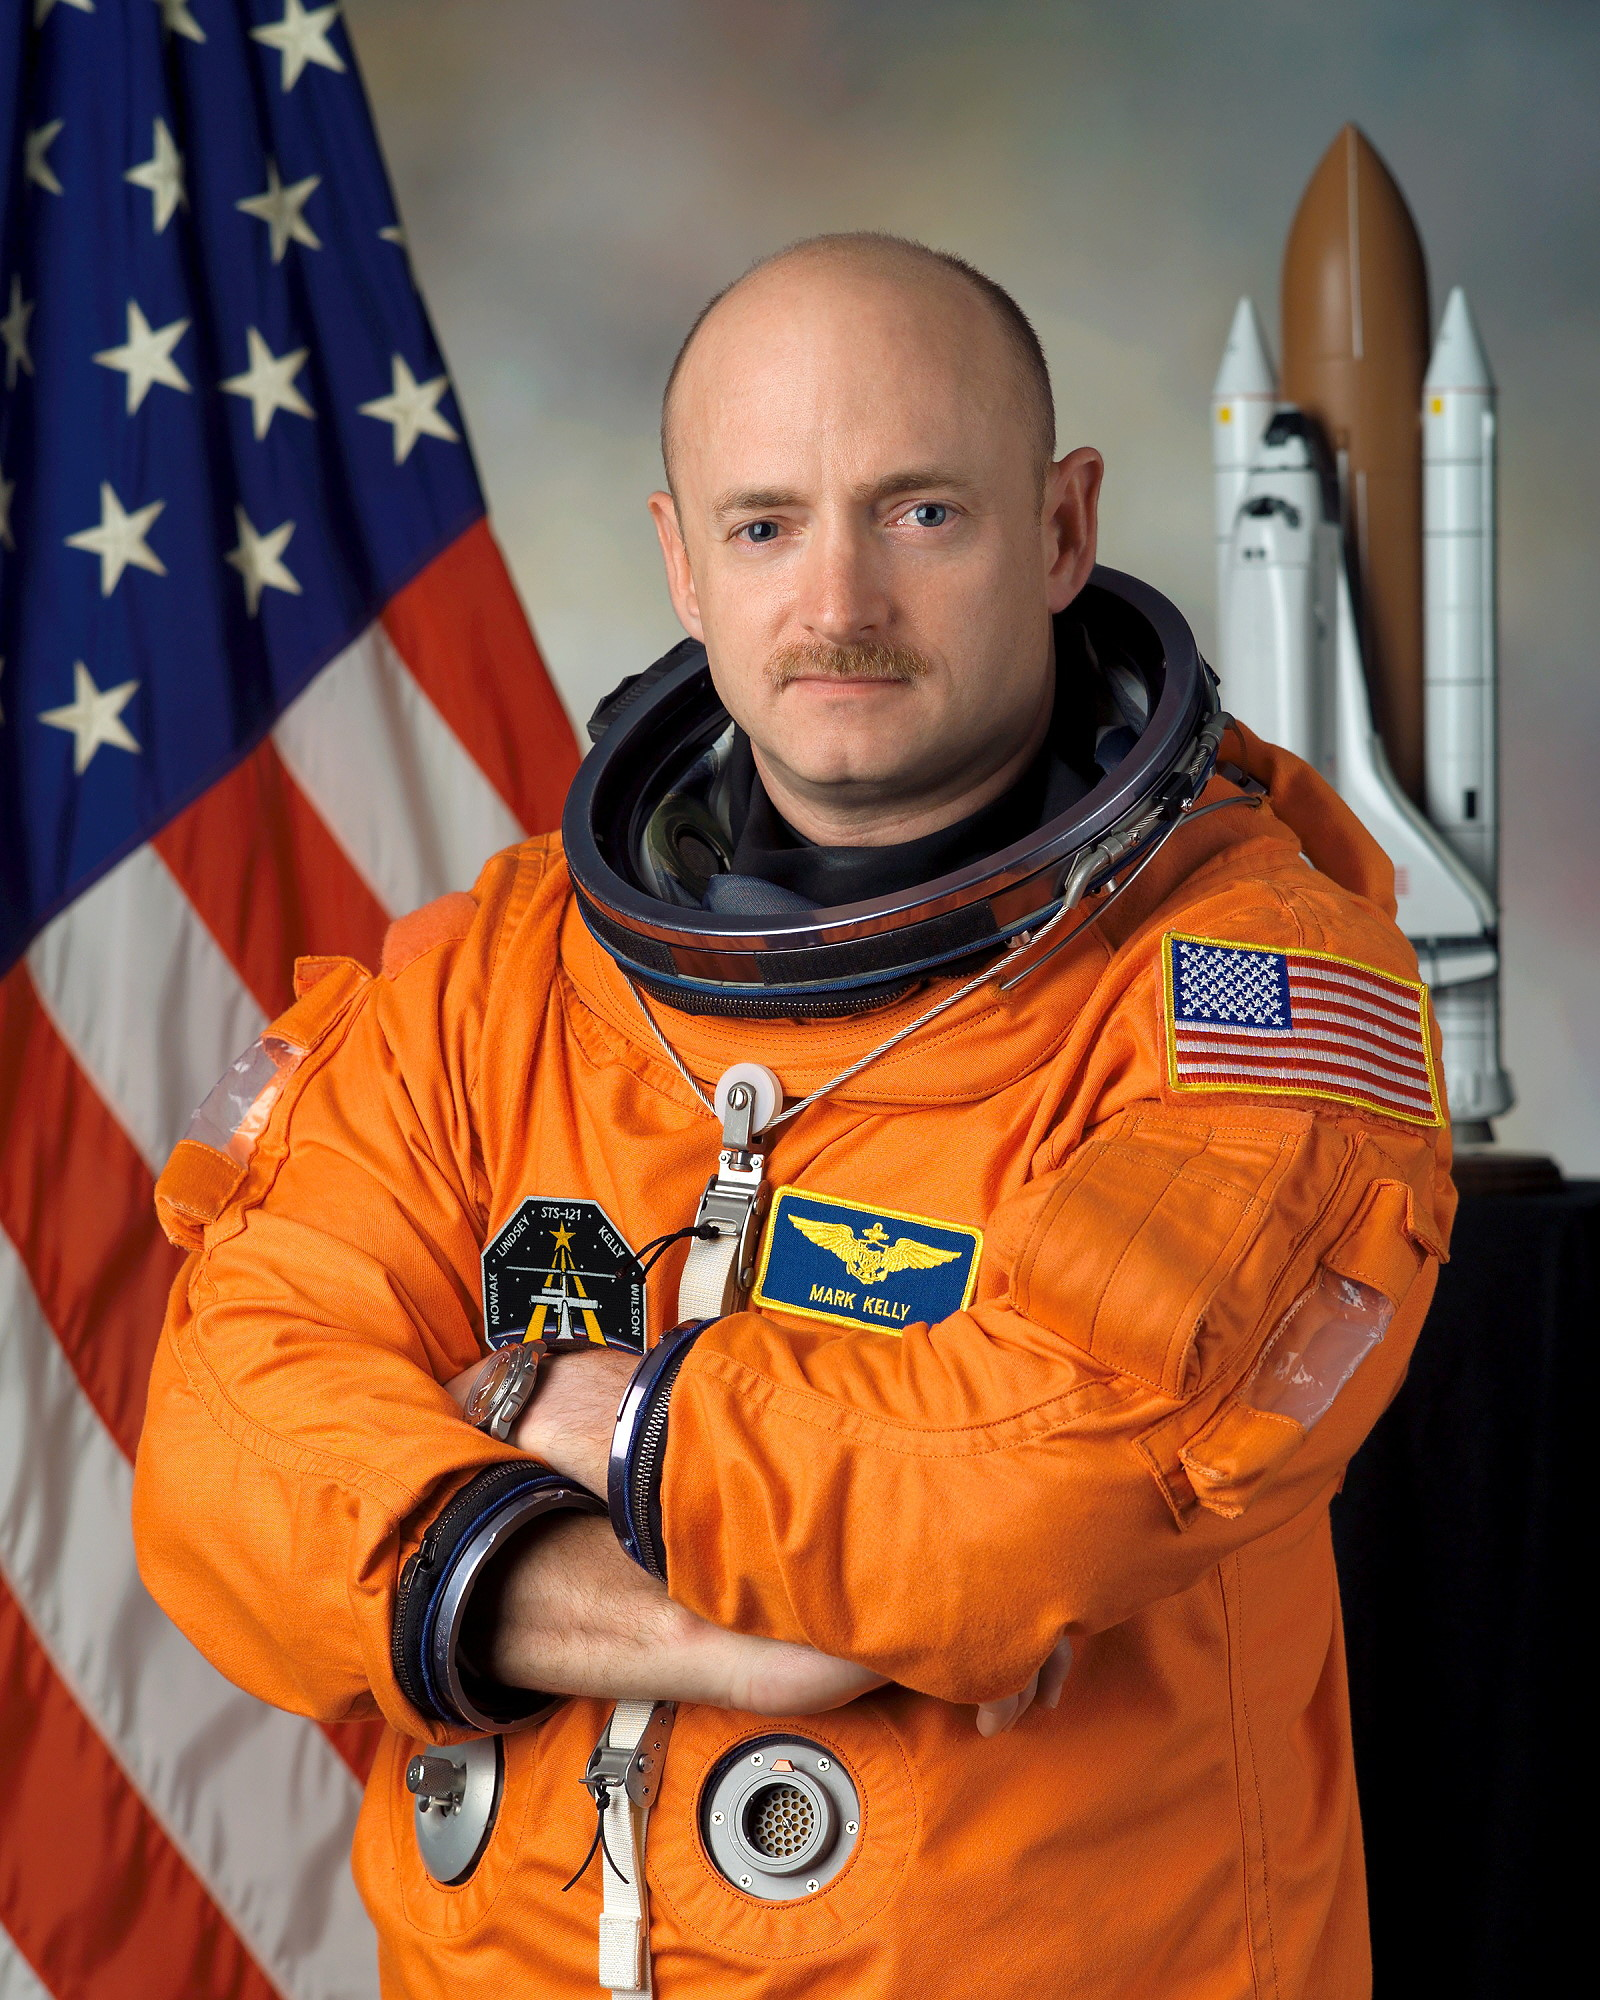 Astronaut Biography: Mark Kelly